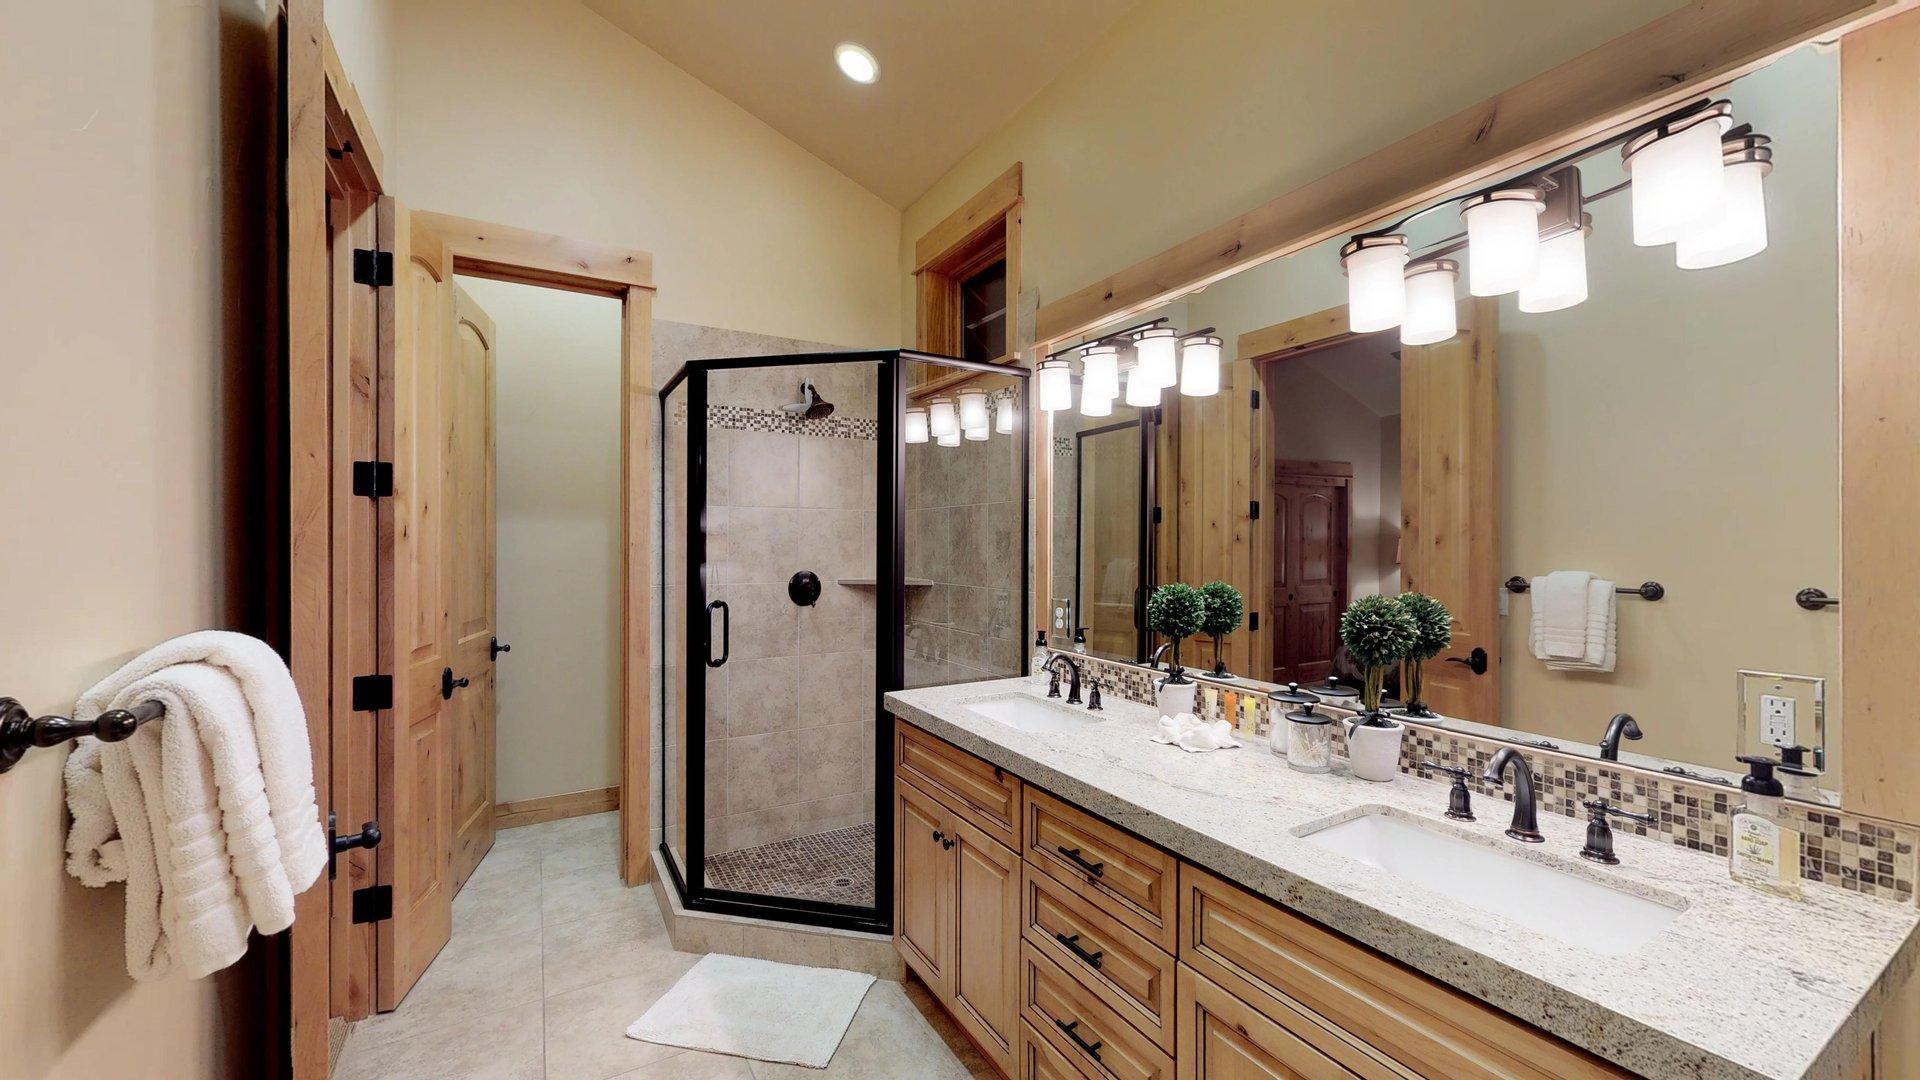 Bathroom Features Double Vanity and Walk-In Shower.